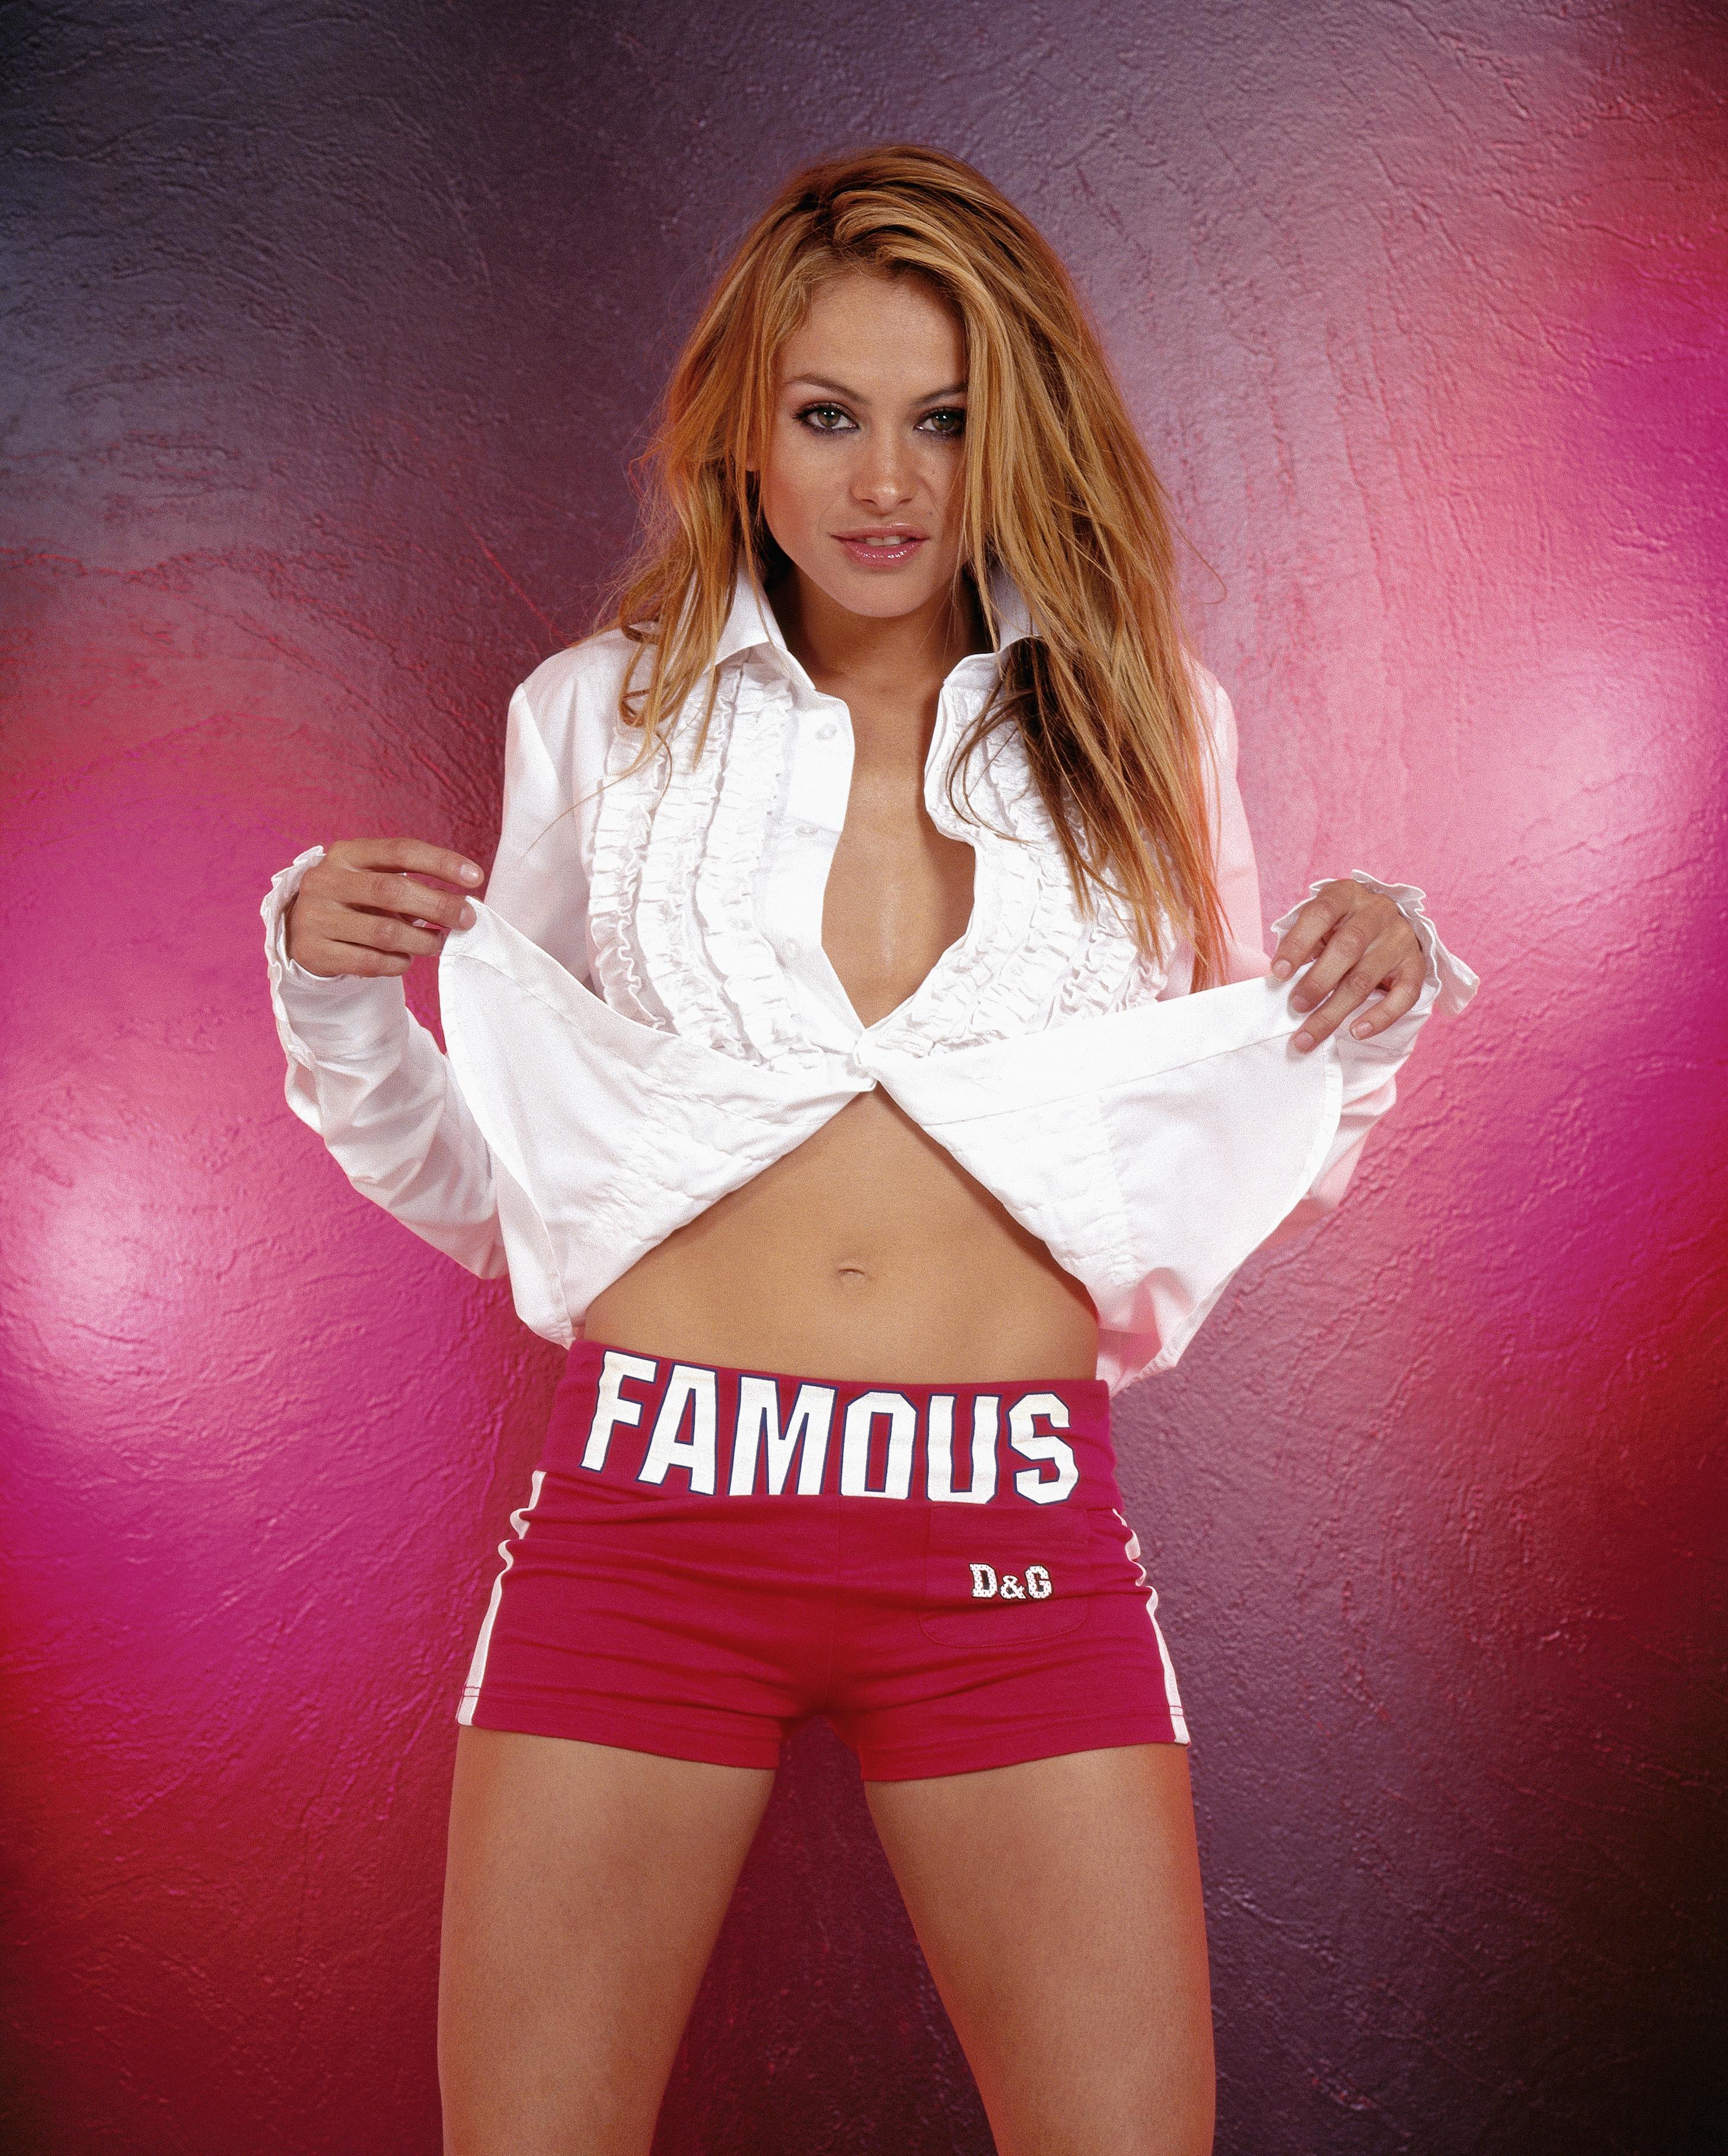 Paulina-Rubio-Bravo-2002-016.jpg